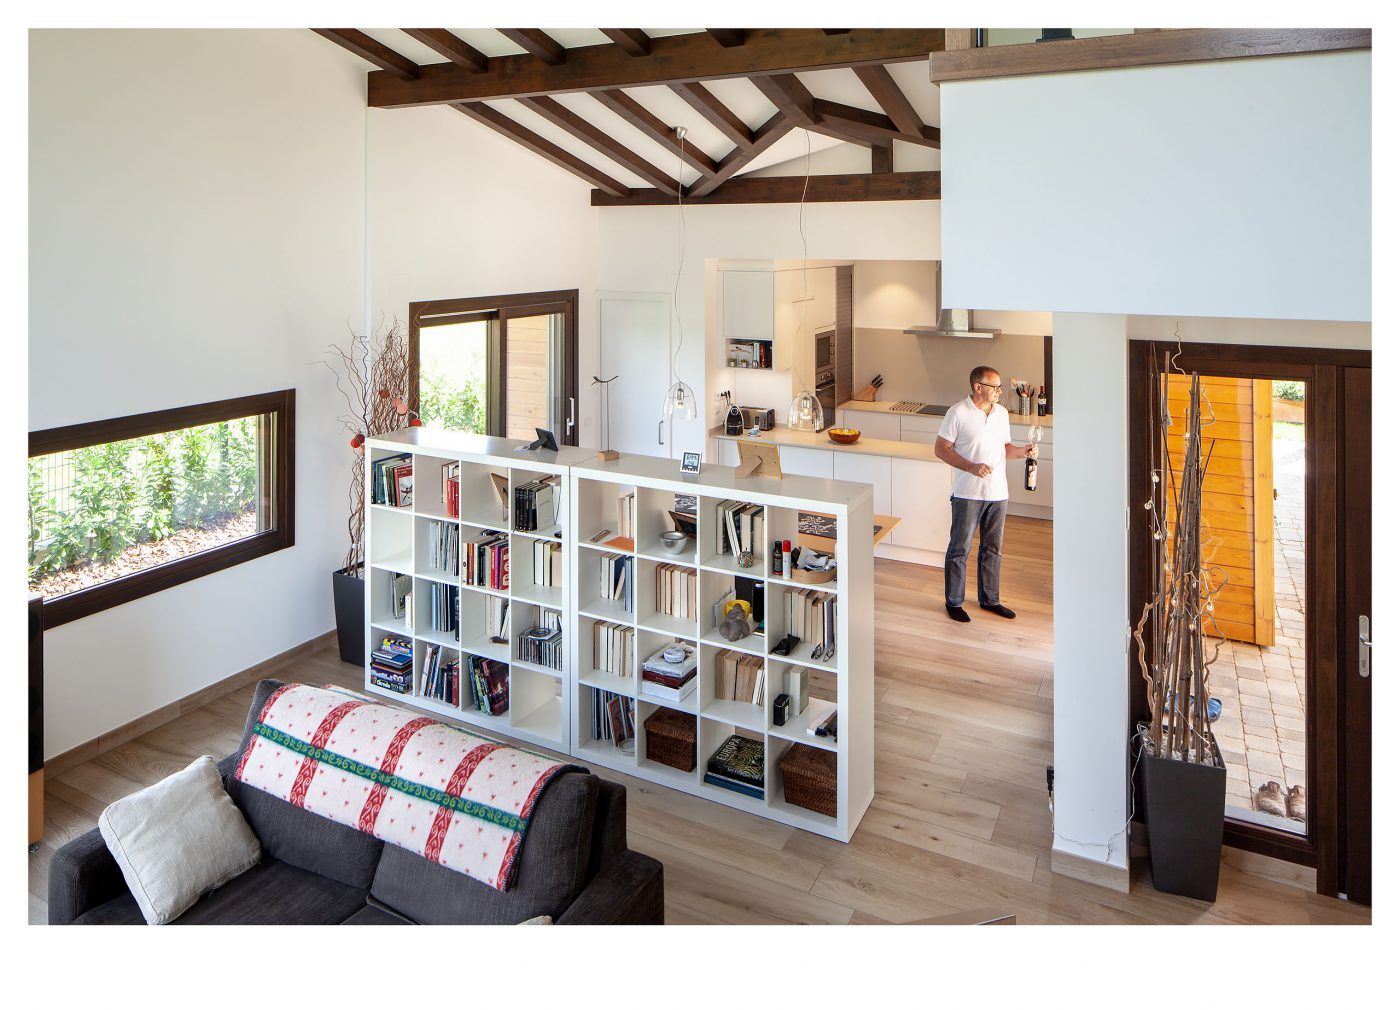 Las casas biopasivas toman protagonismo en Barcelona